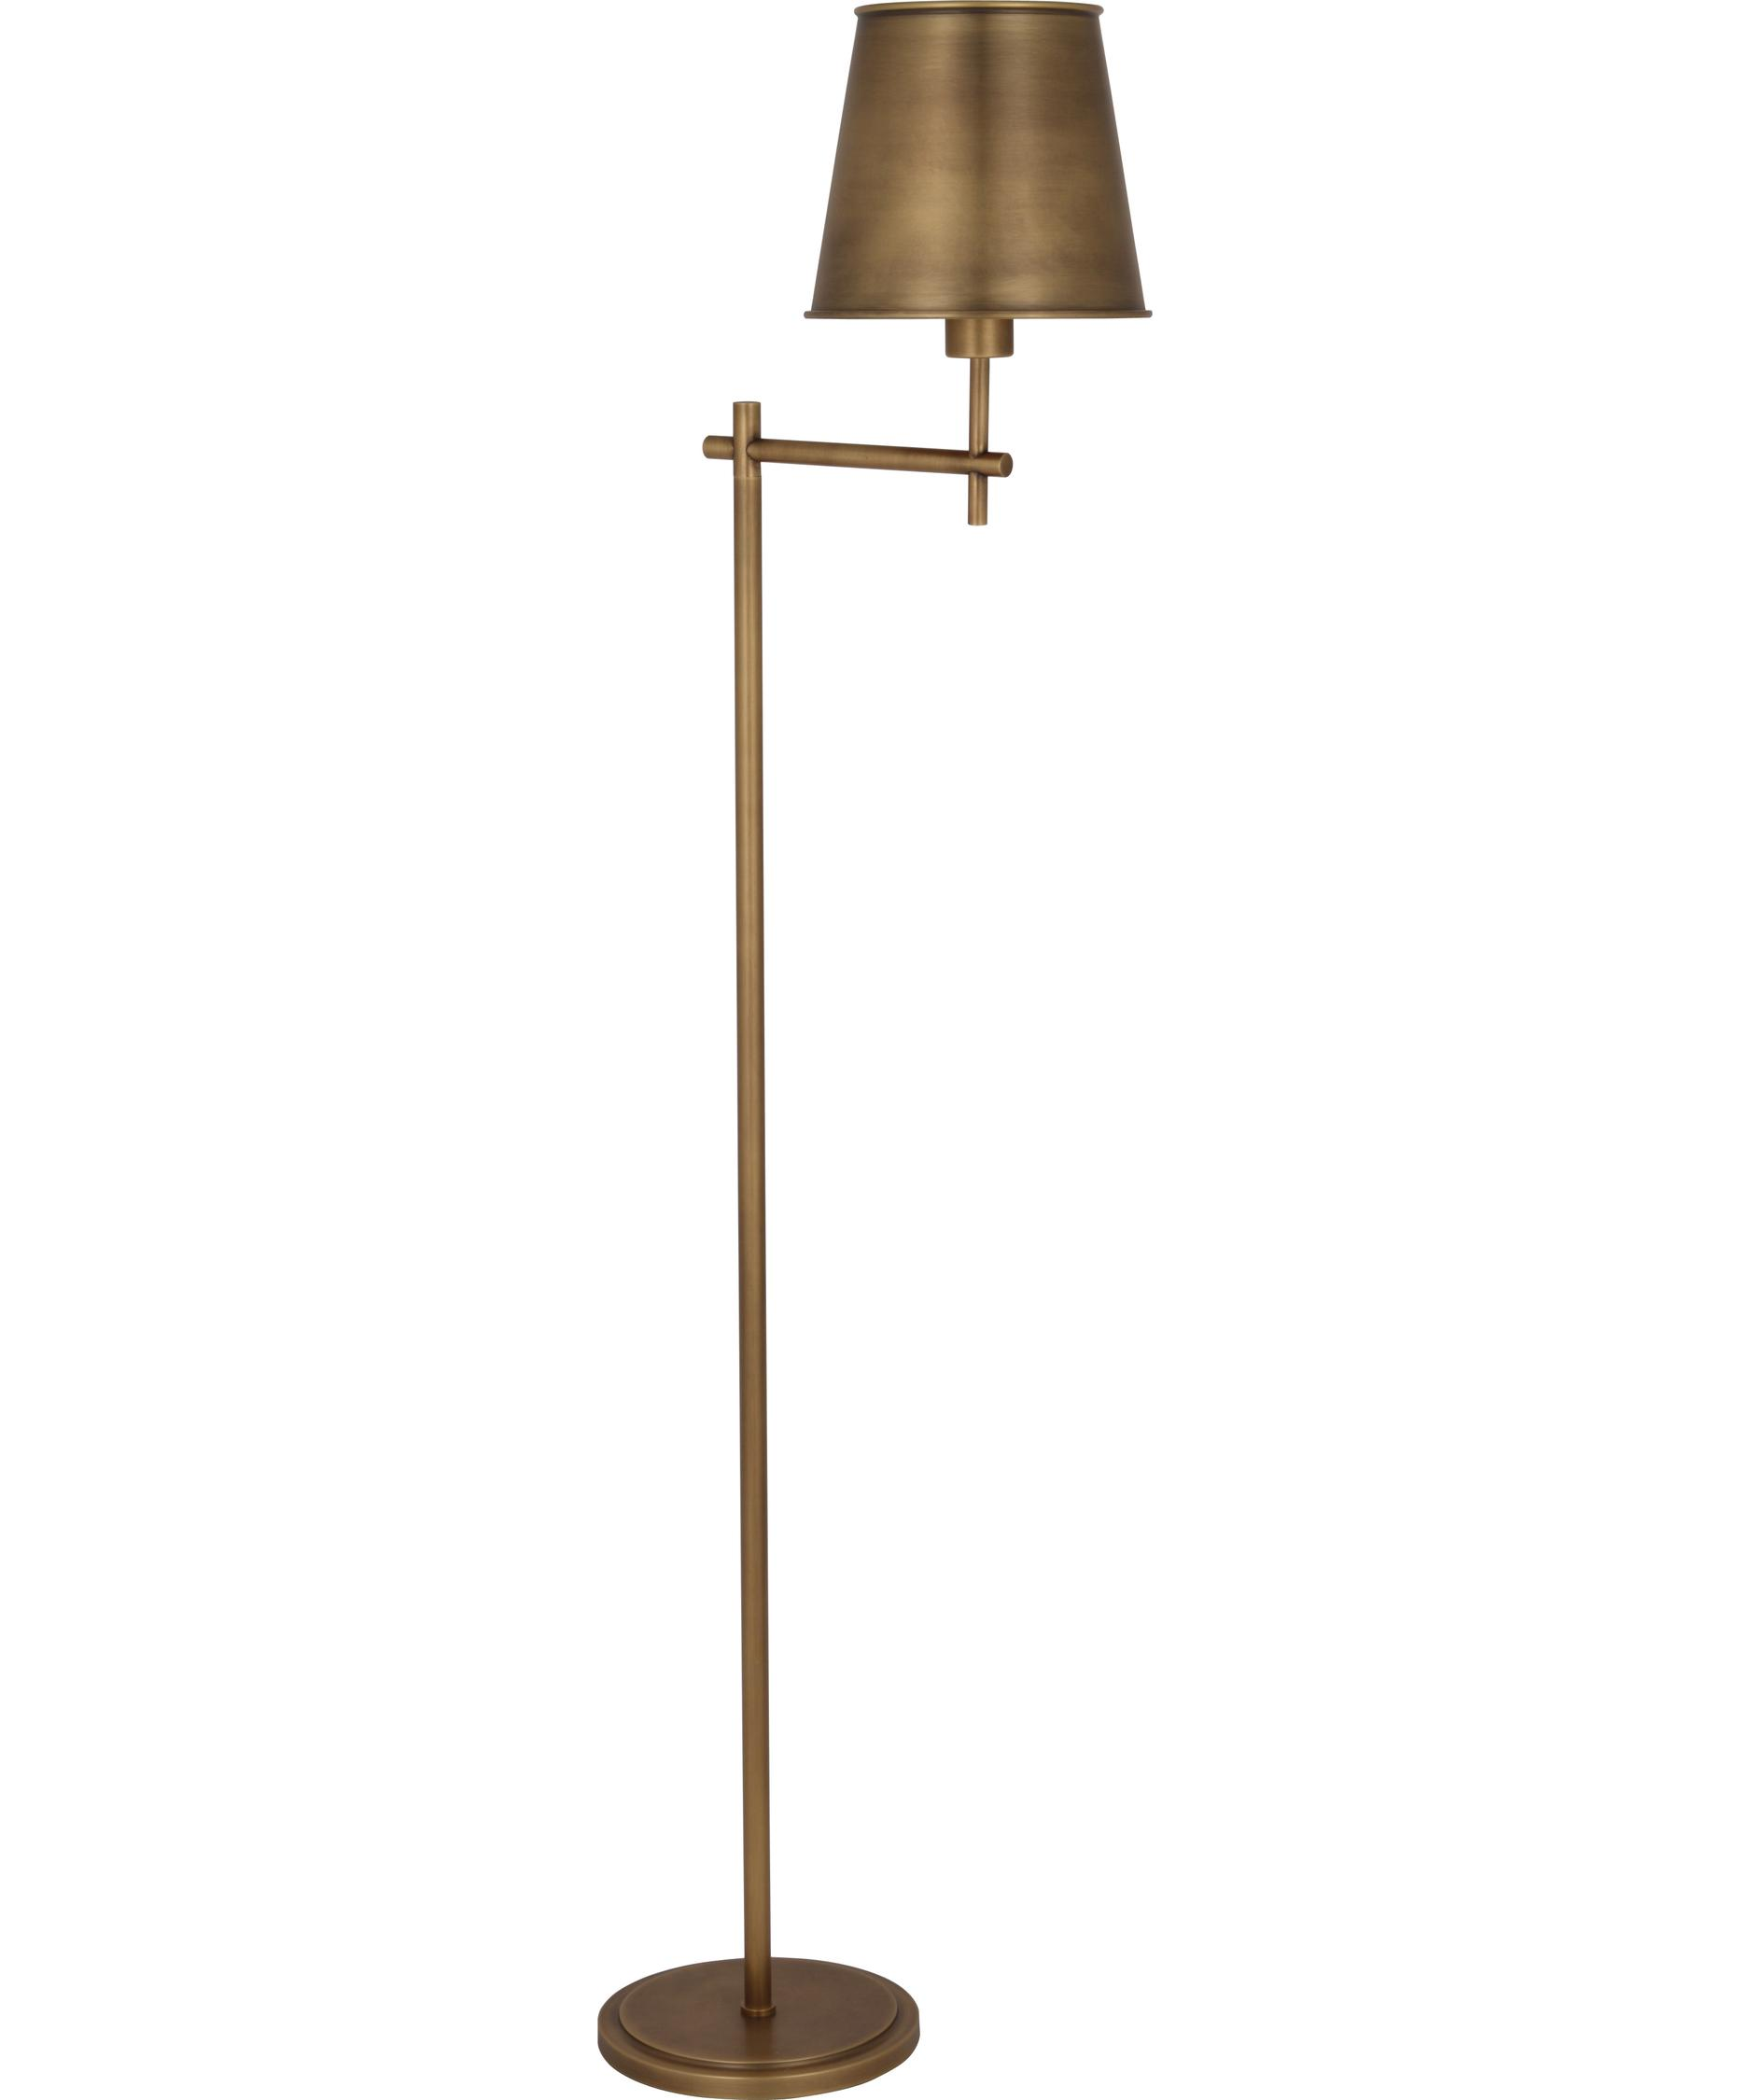 shown in aged brass finish - Robert Abbey Lighting